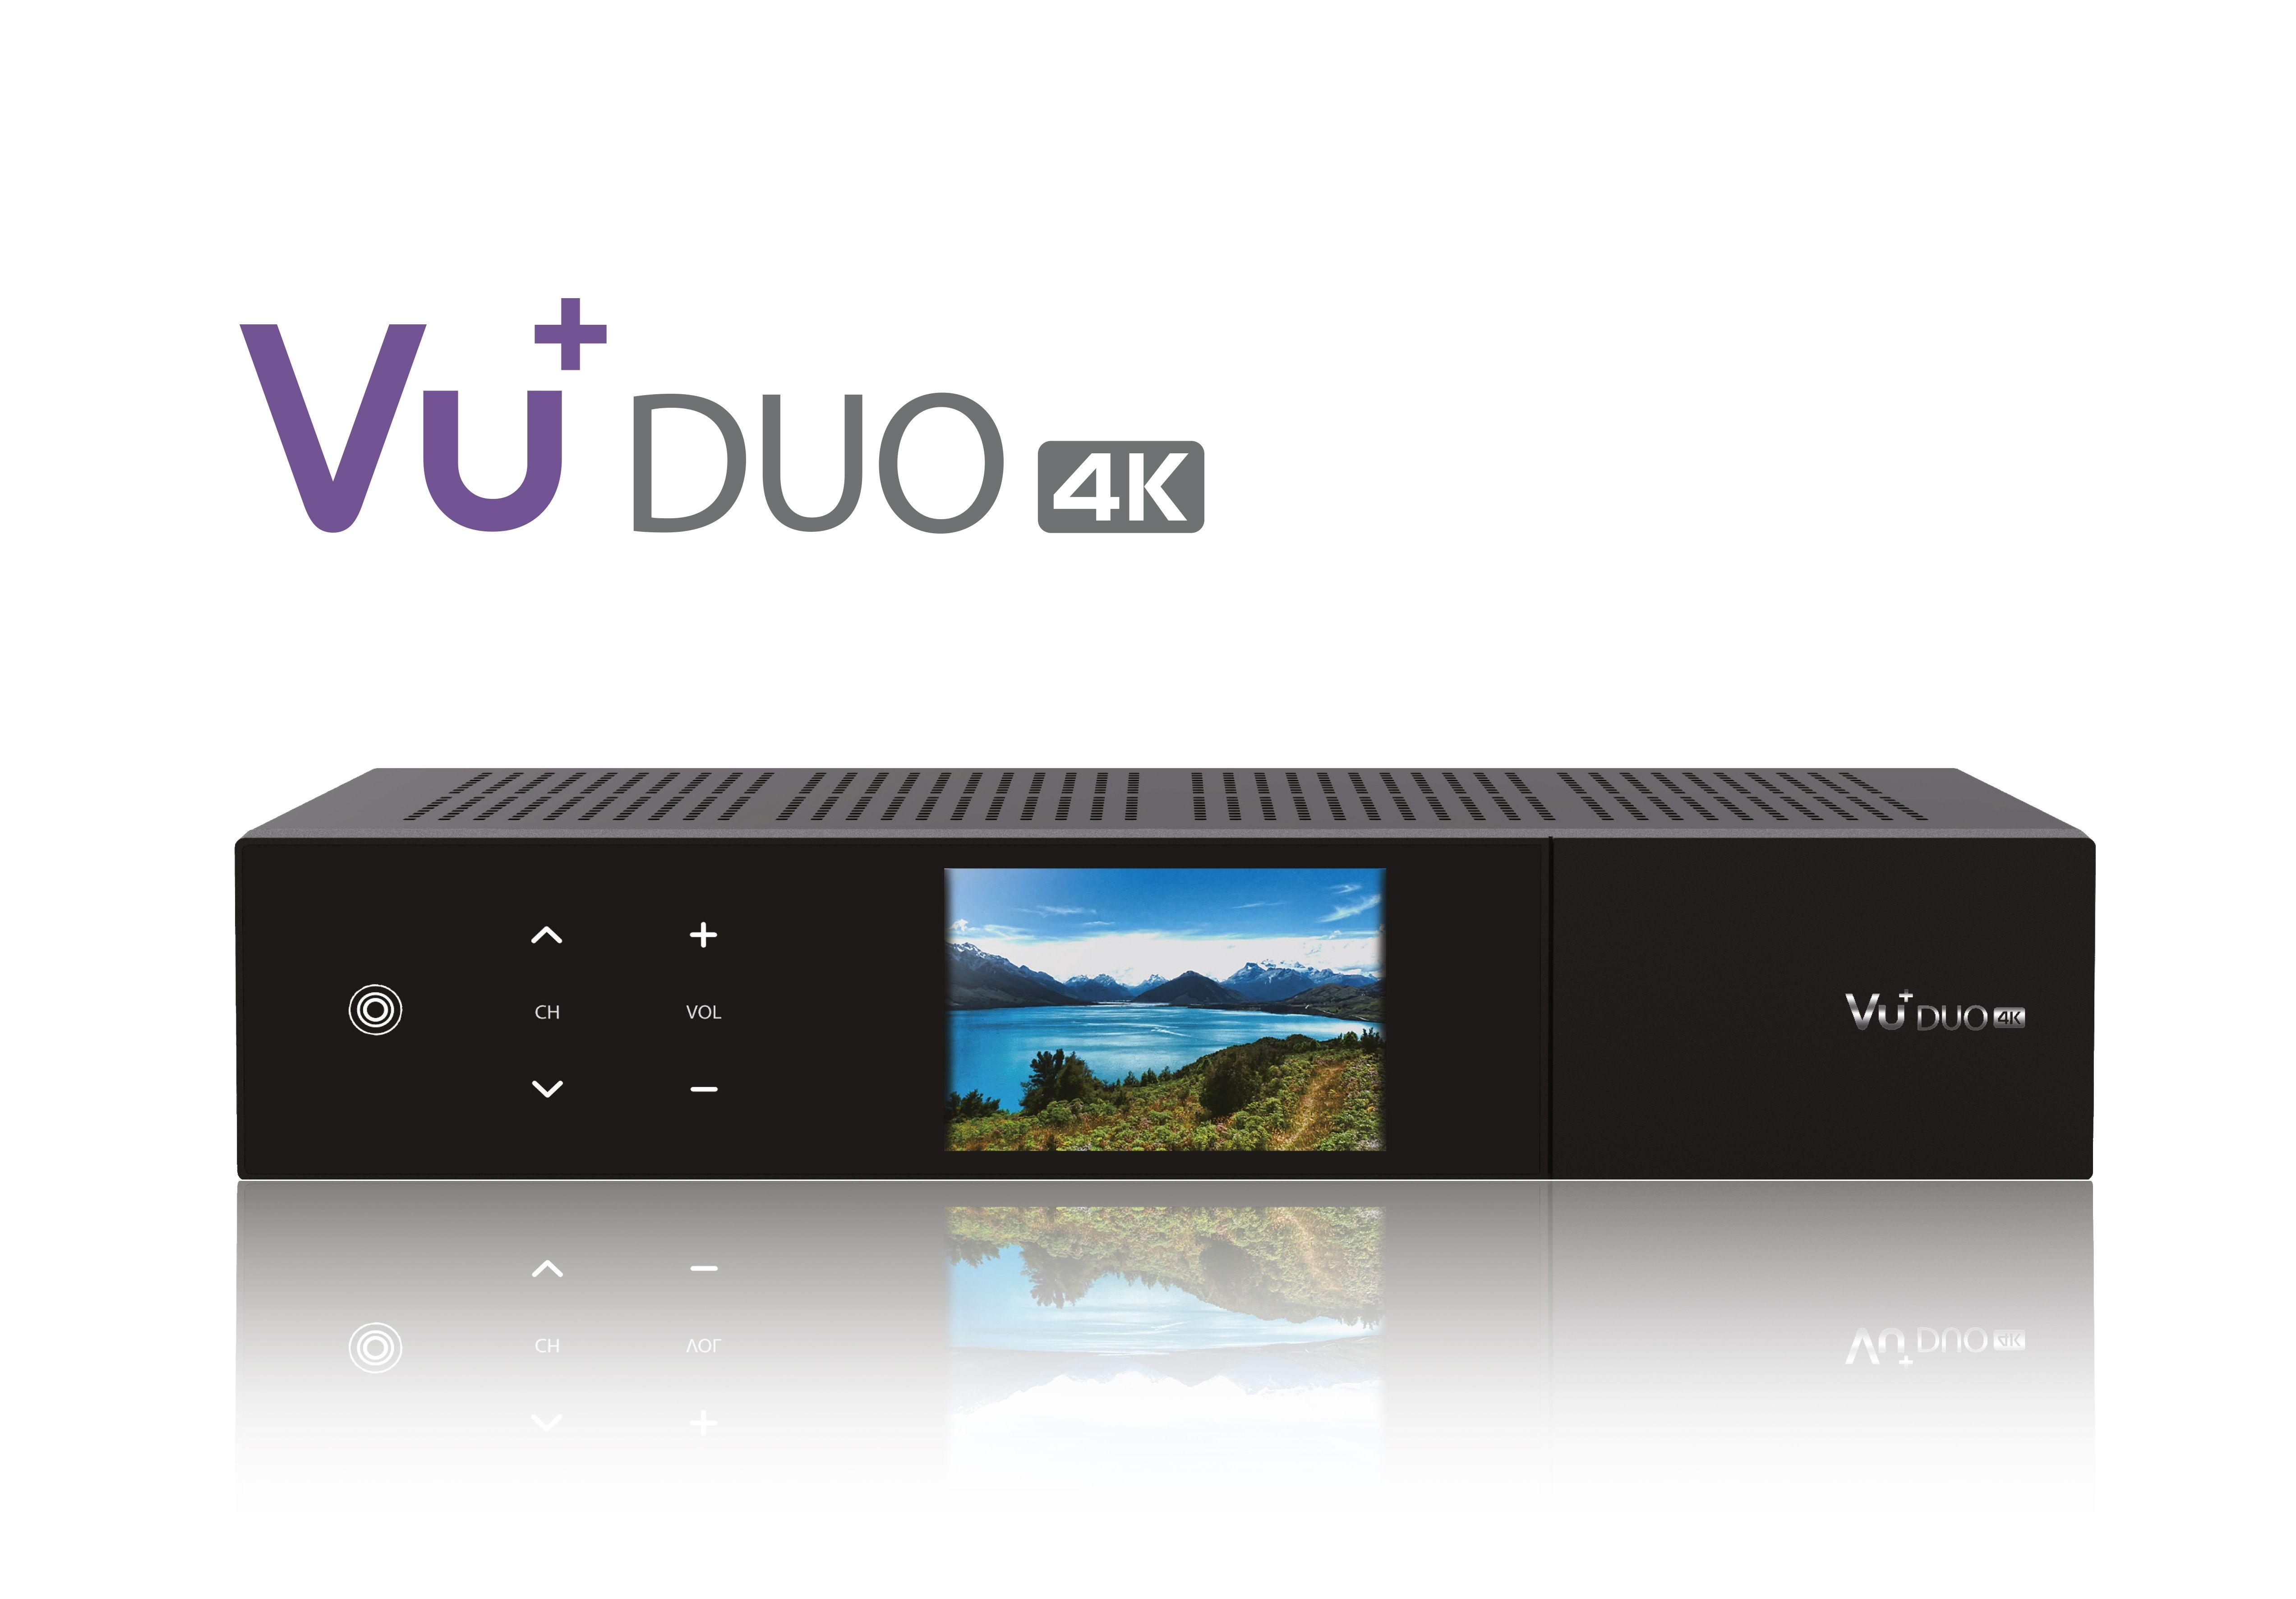 VU+ Duo 4K 2x DVB-C FBC Tuner PVR ready Linux Receiver UHD 2160p